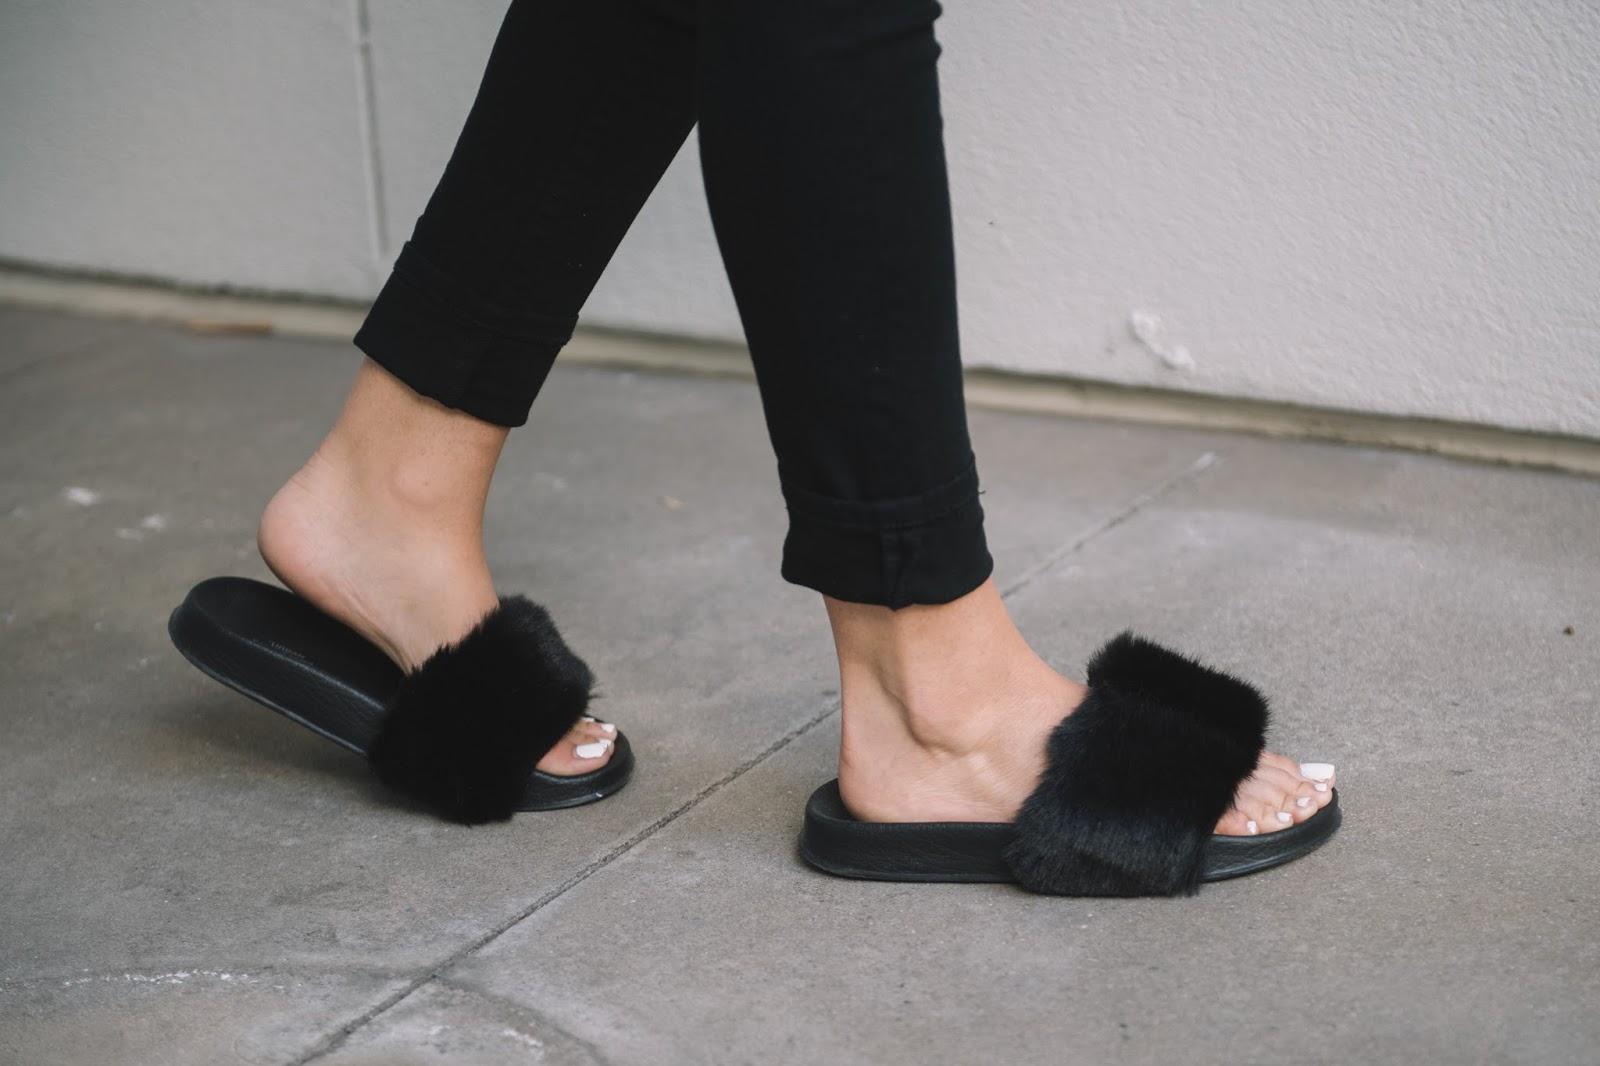 Urban Outfitters Black Fur Slippers - @ taylorwinkelmeyer